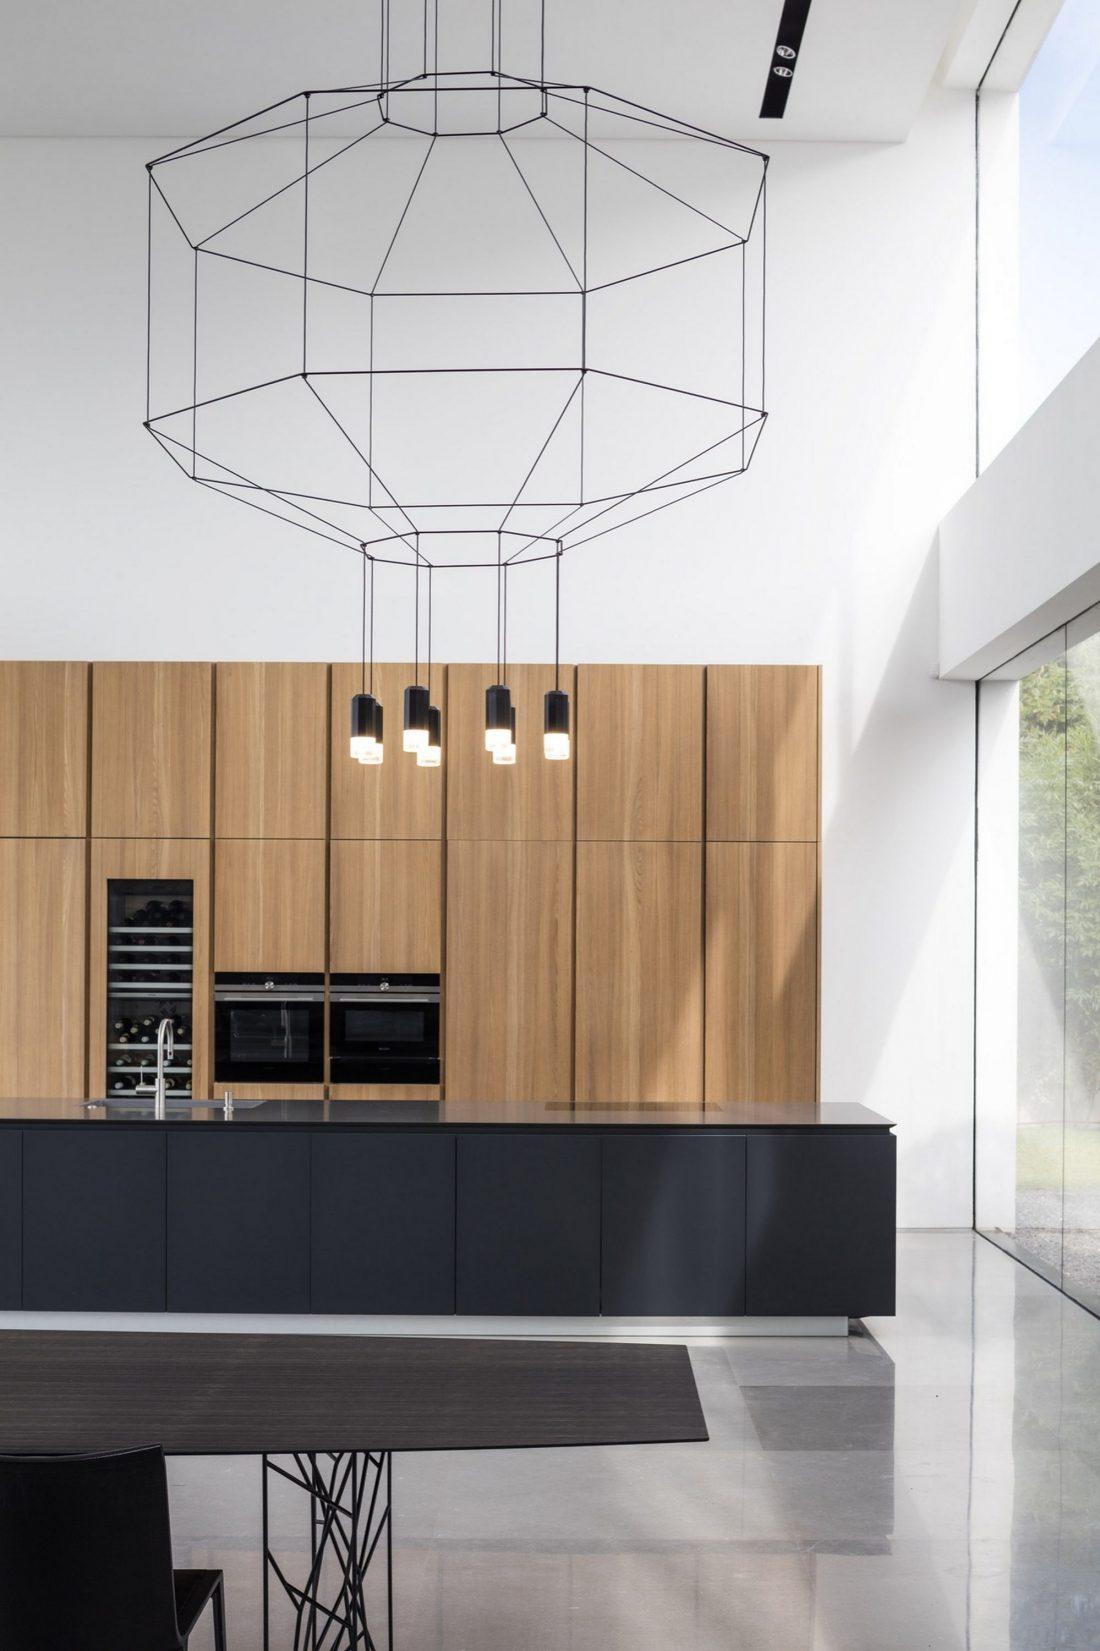 700-kvadratnyh-metrov-sveta-f-house-po-proektu-studii-pitsou-kedem-33